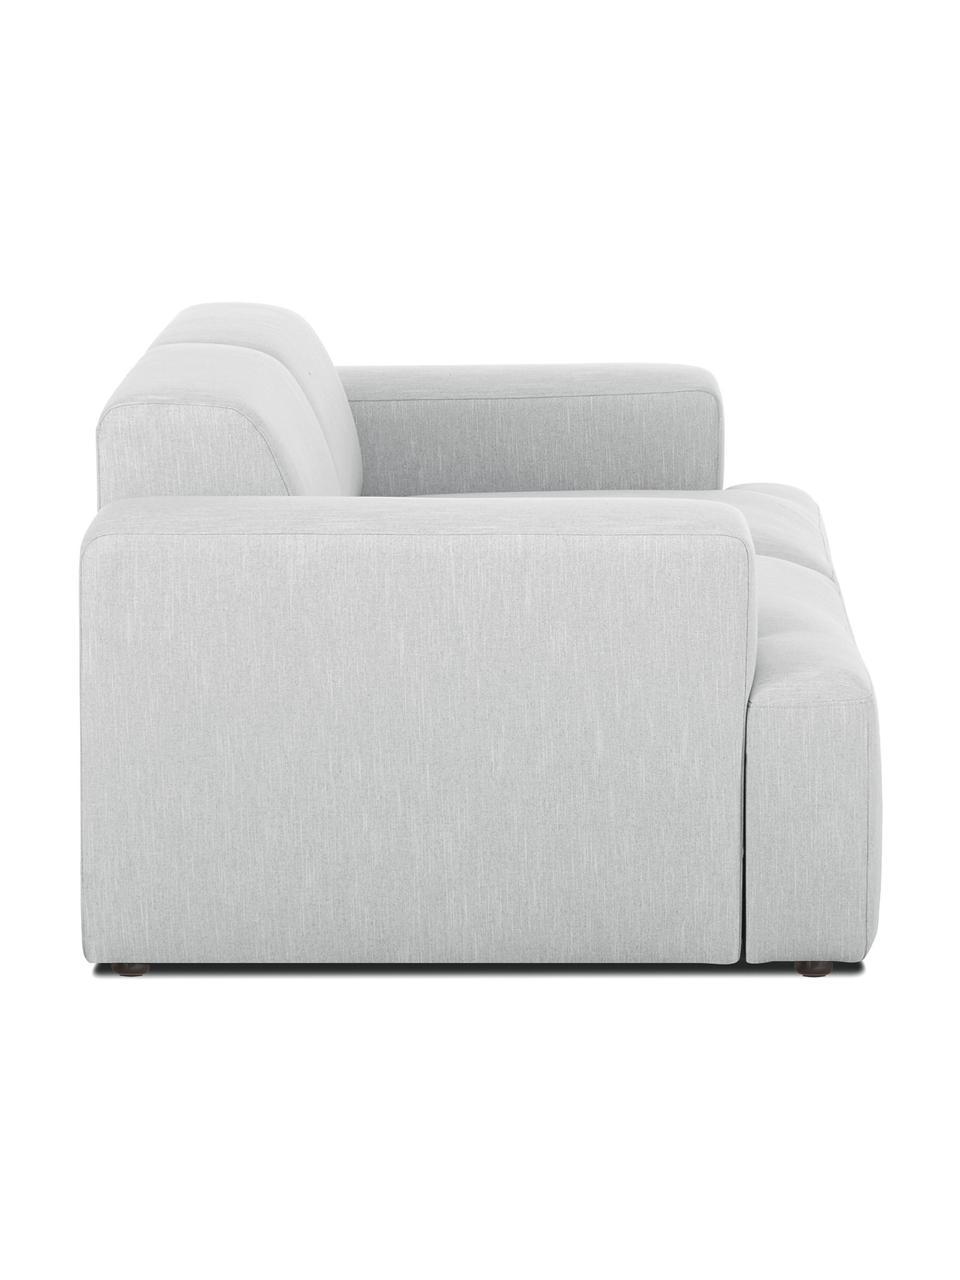 Canapé 2places gris clair Melva, Tissu gris clair